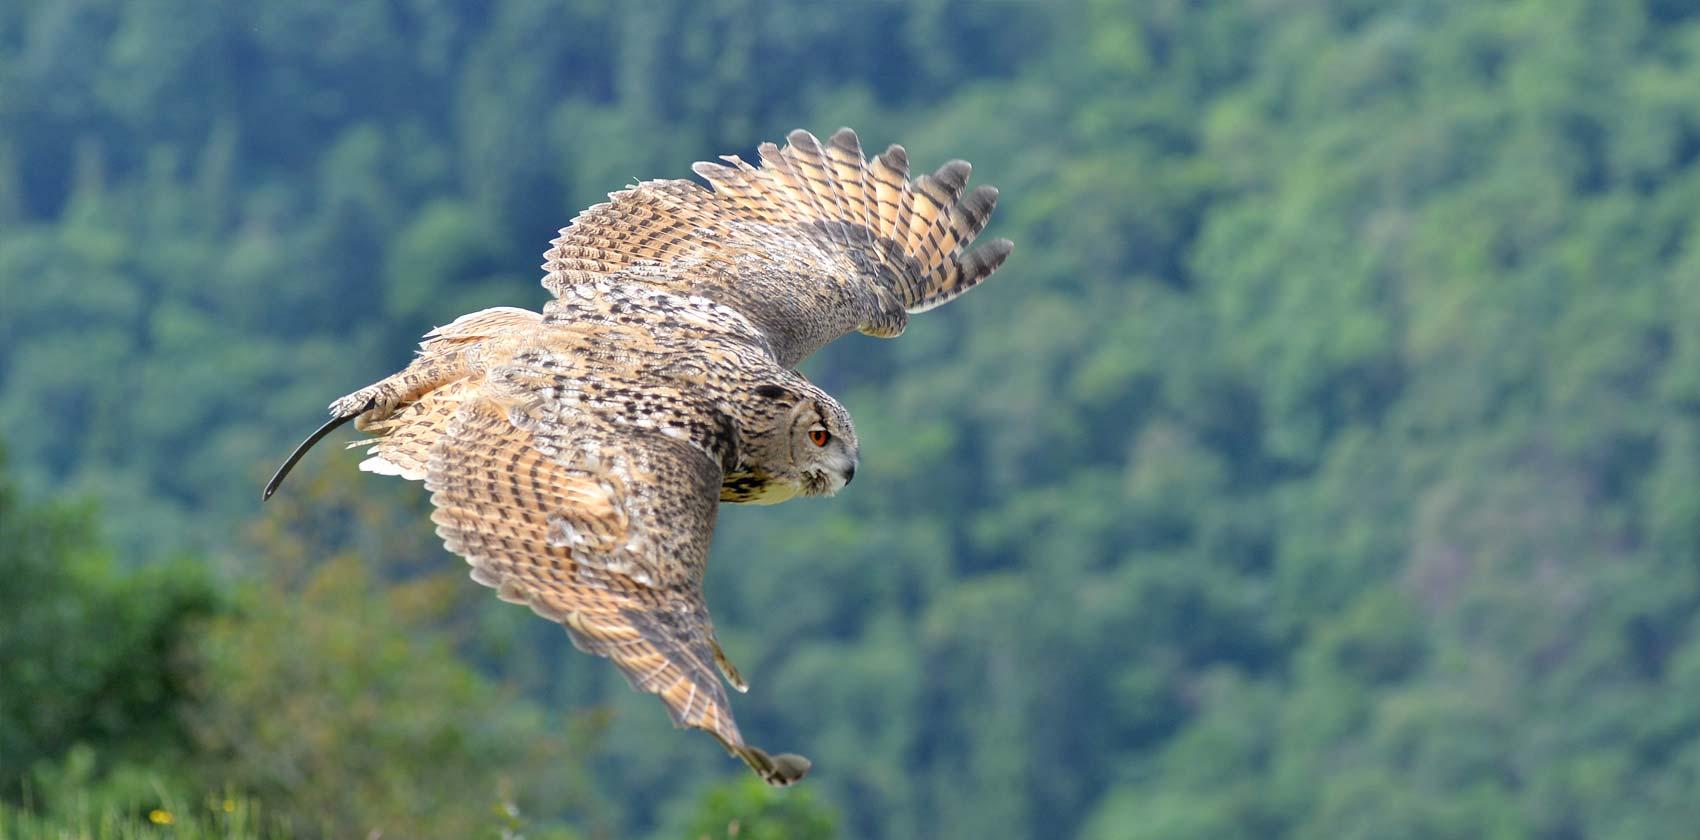 Birds of preys and flightdisplays